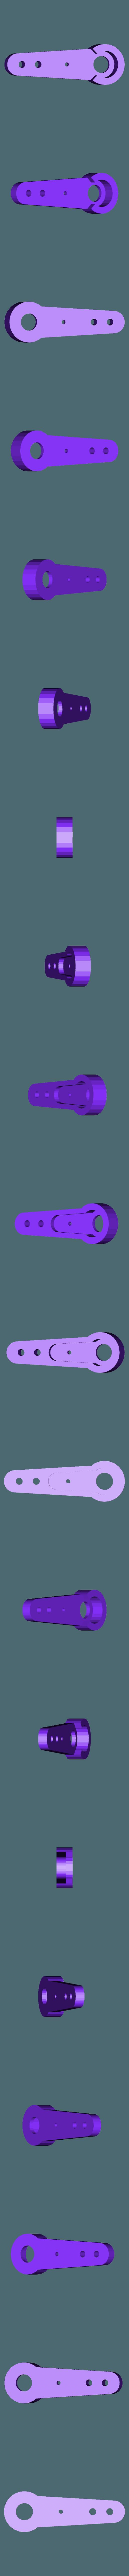 servo_arm.stl Download free STL file Micro 9g Servo Arm Extender • 3D print model, peaberry